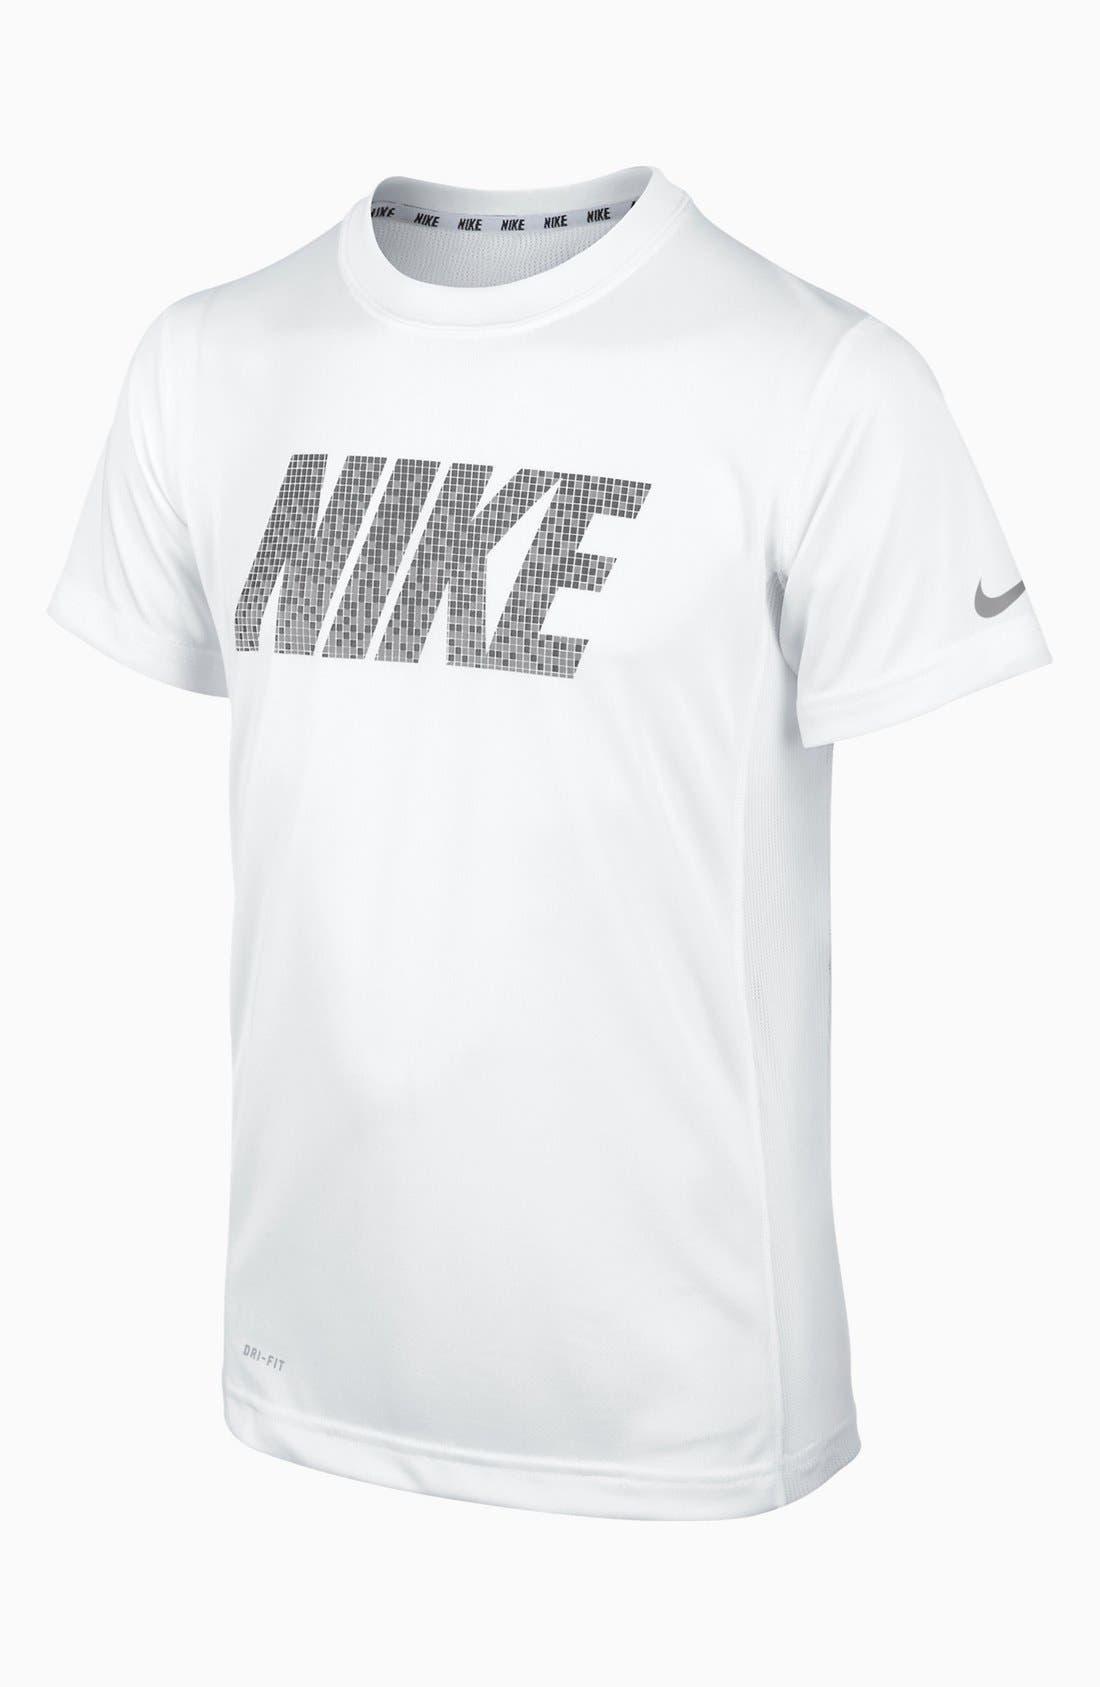 Alternate Image 1 Selected - Nike 'Speed' T-Shirt (Big Boys)